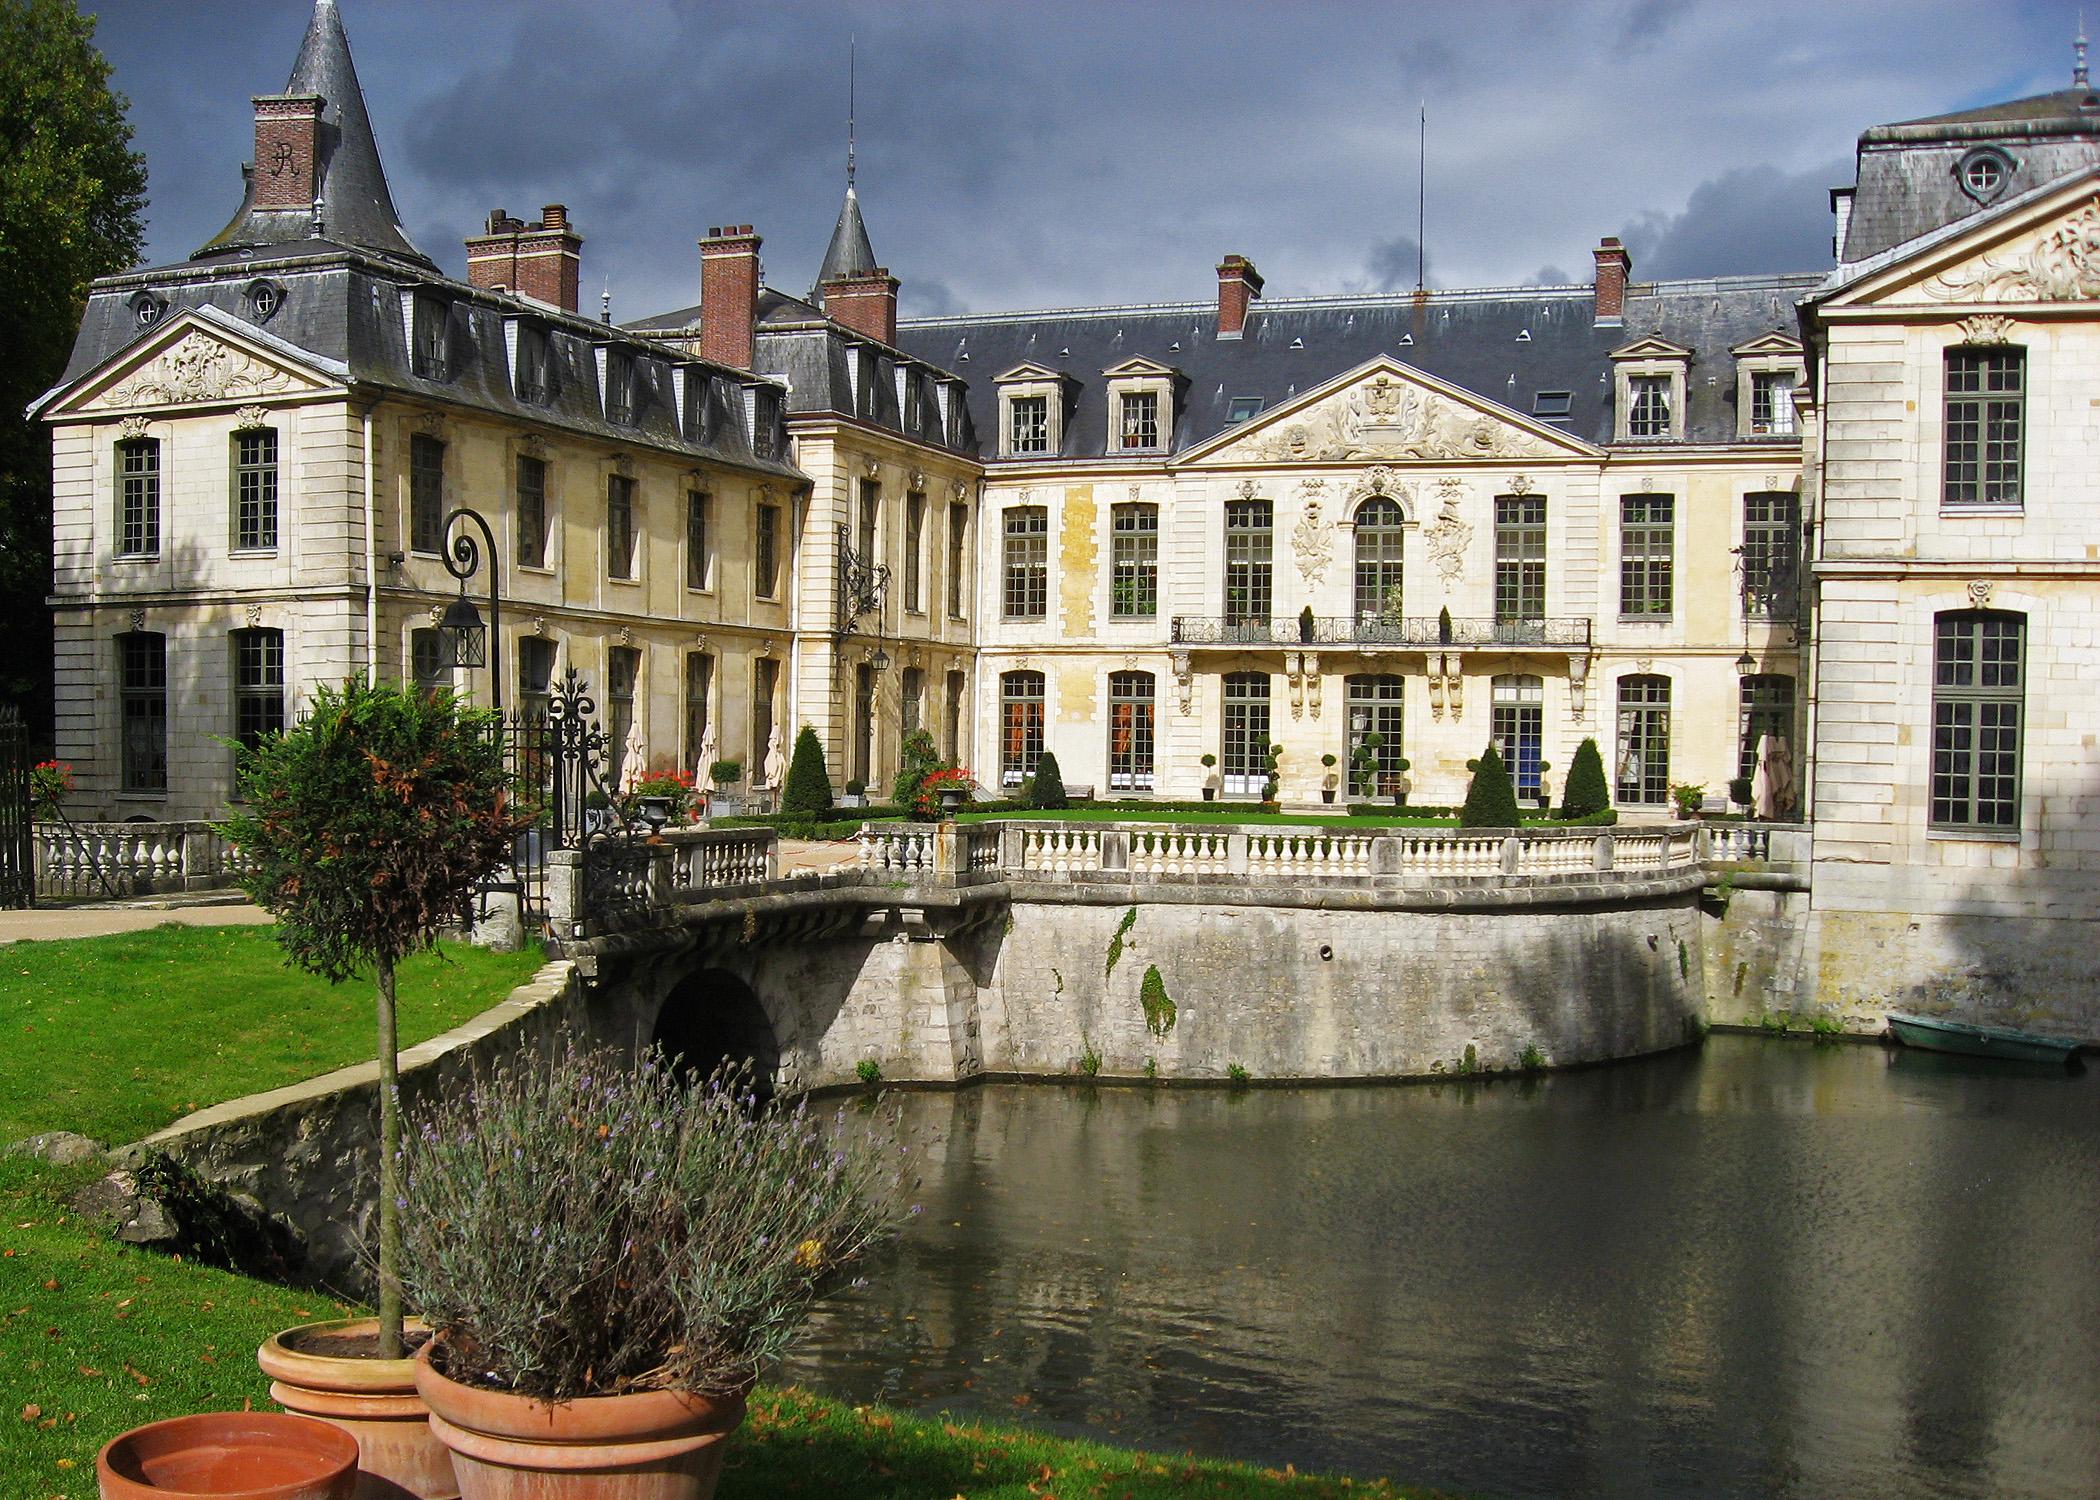 chteau dermenonville wikiwand - Chateau D Ermenonville Mariage